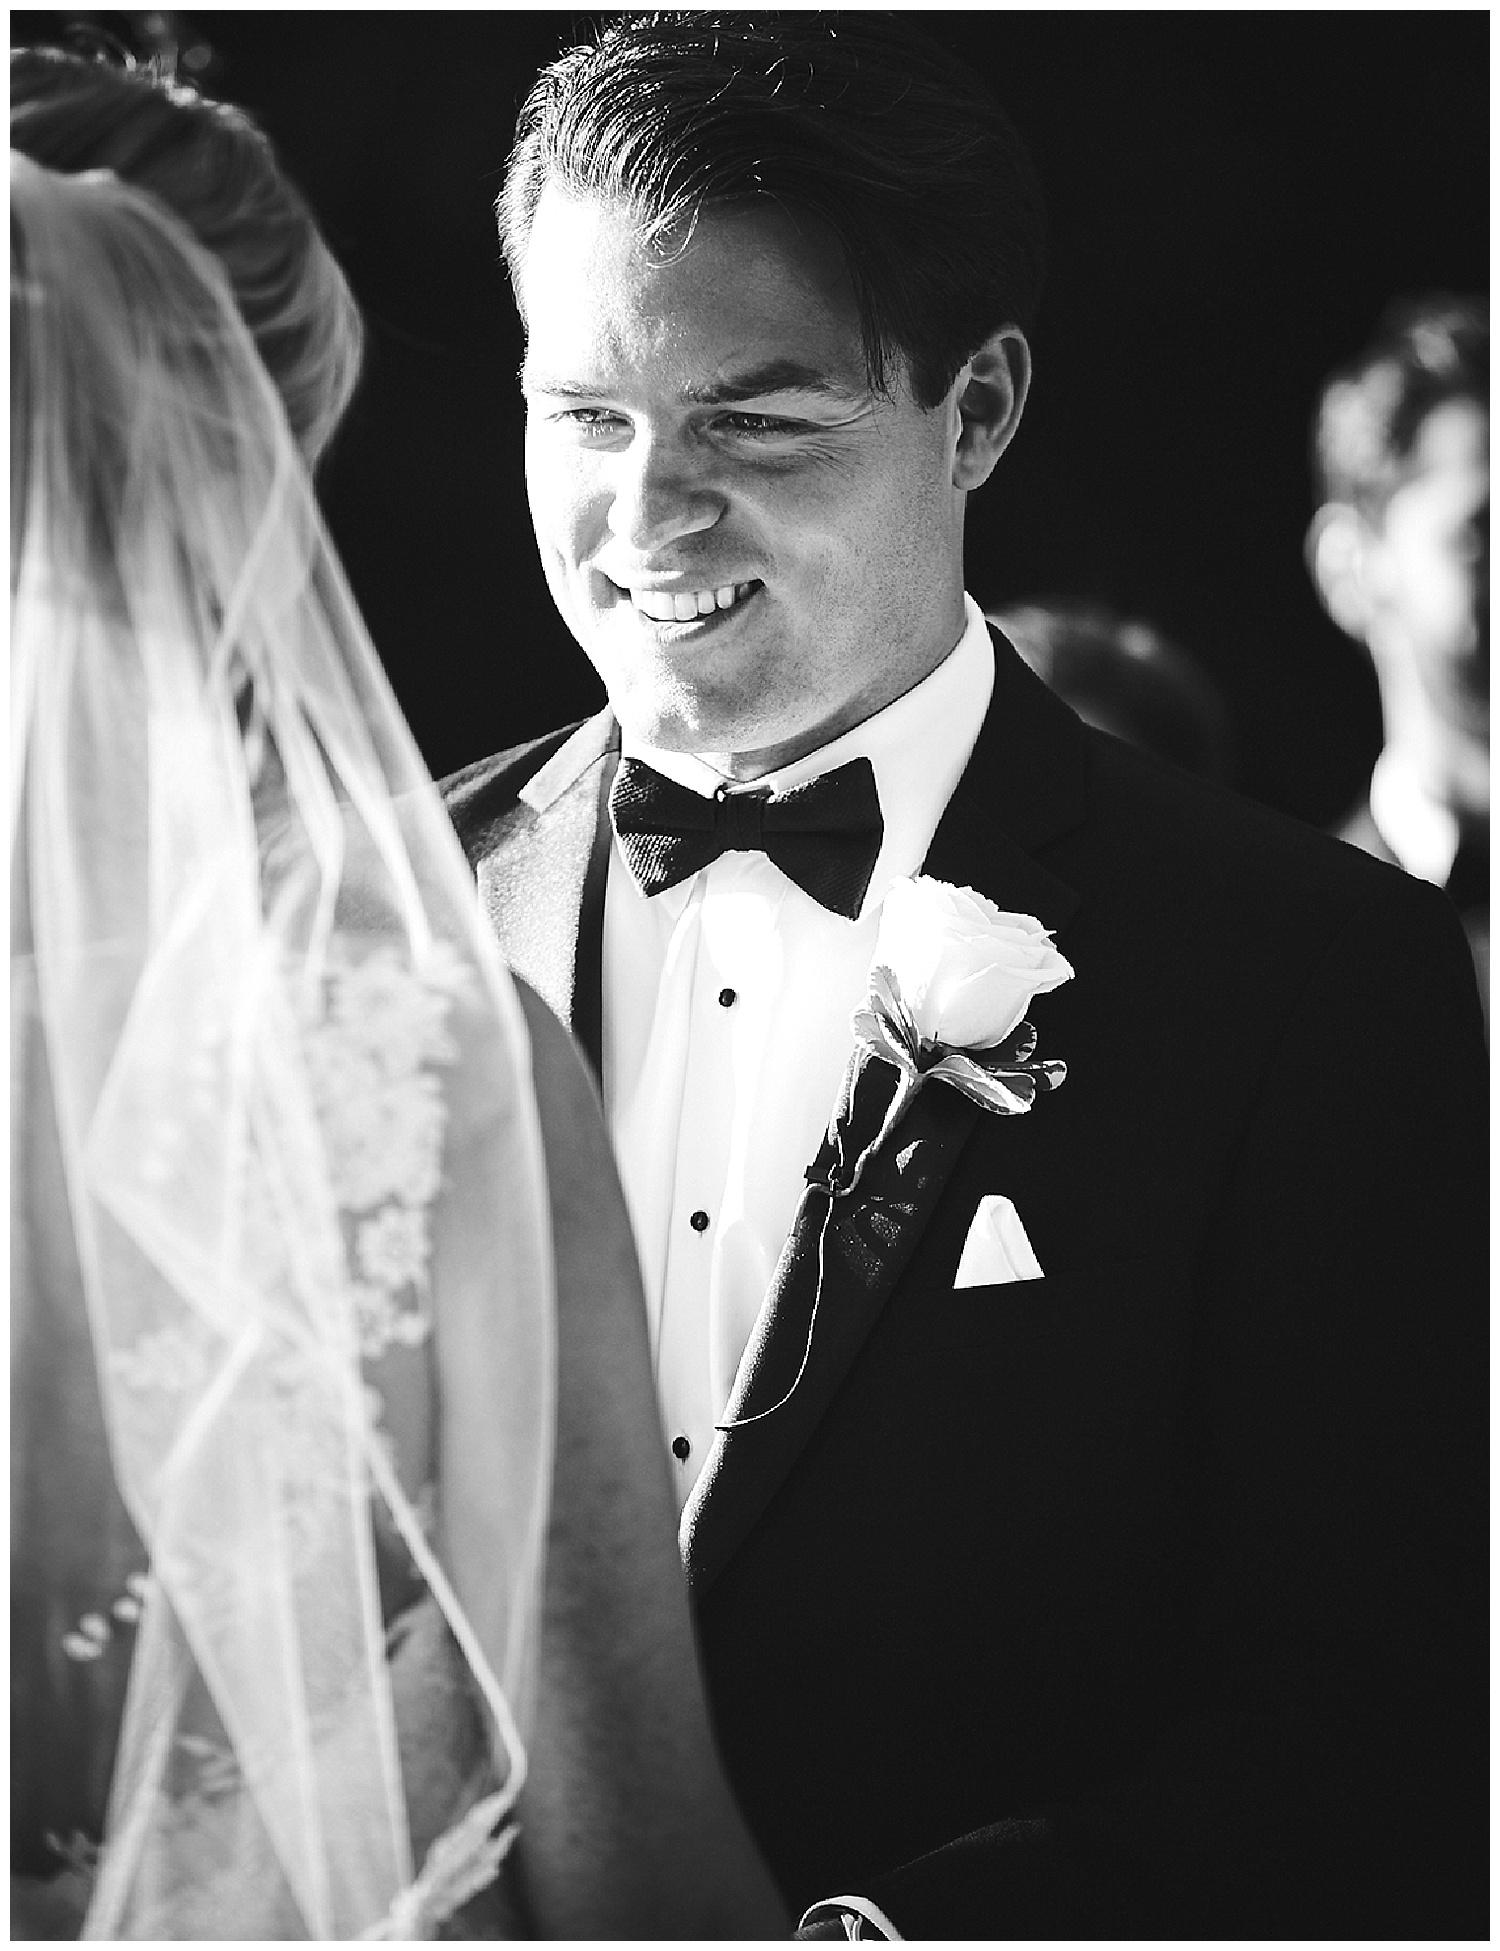 Westchester Weddings | Tappan Hill Mansion | Tarrytown NY | www.redoakweddings.com